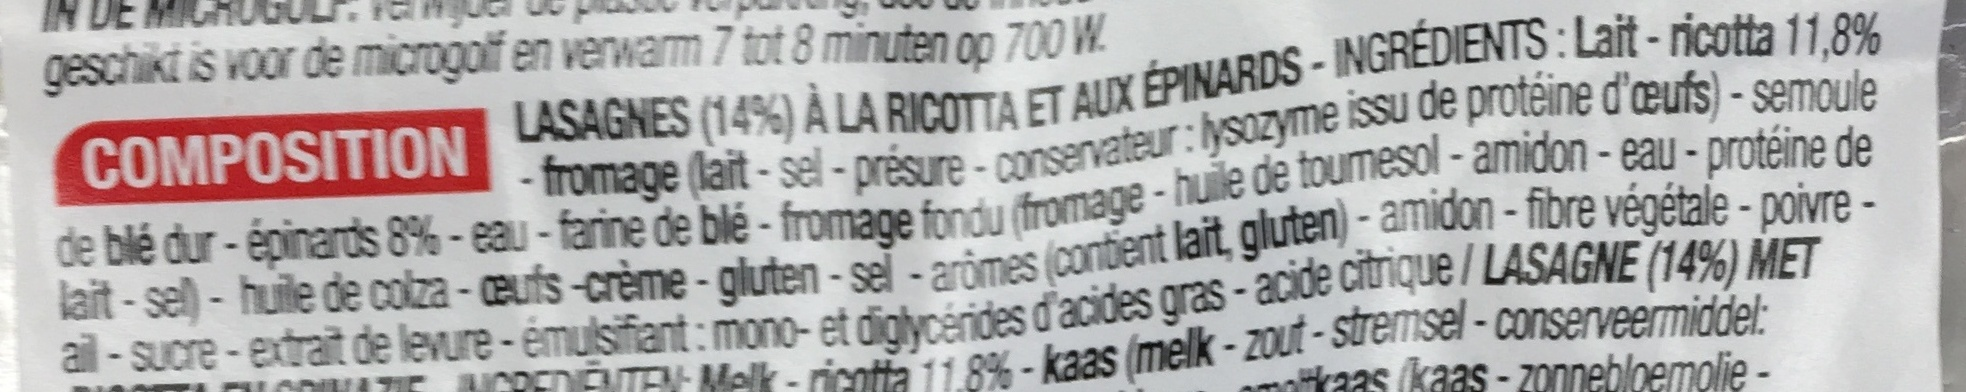 Lasagnes Ricotta Épinard gratinées - Ingrédients - fr